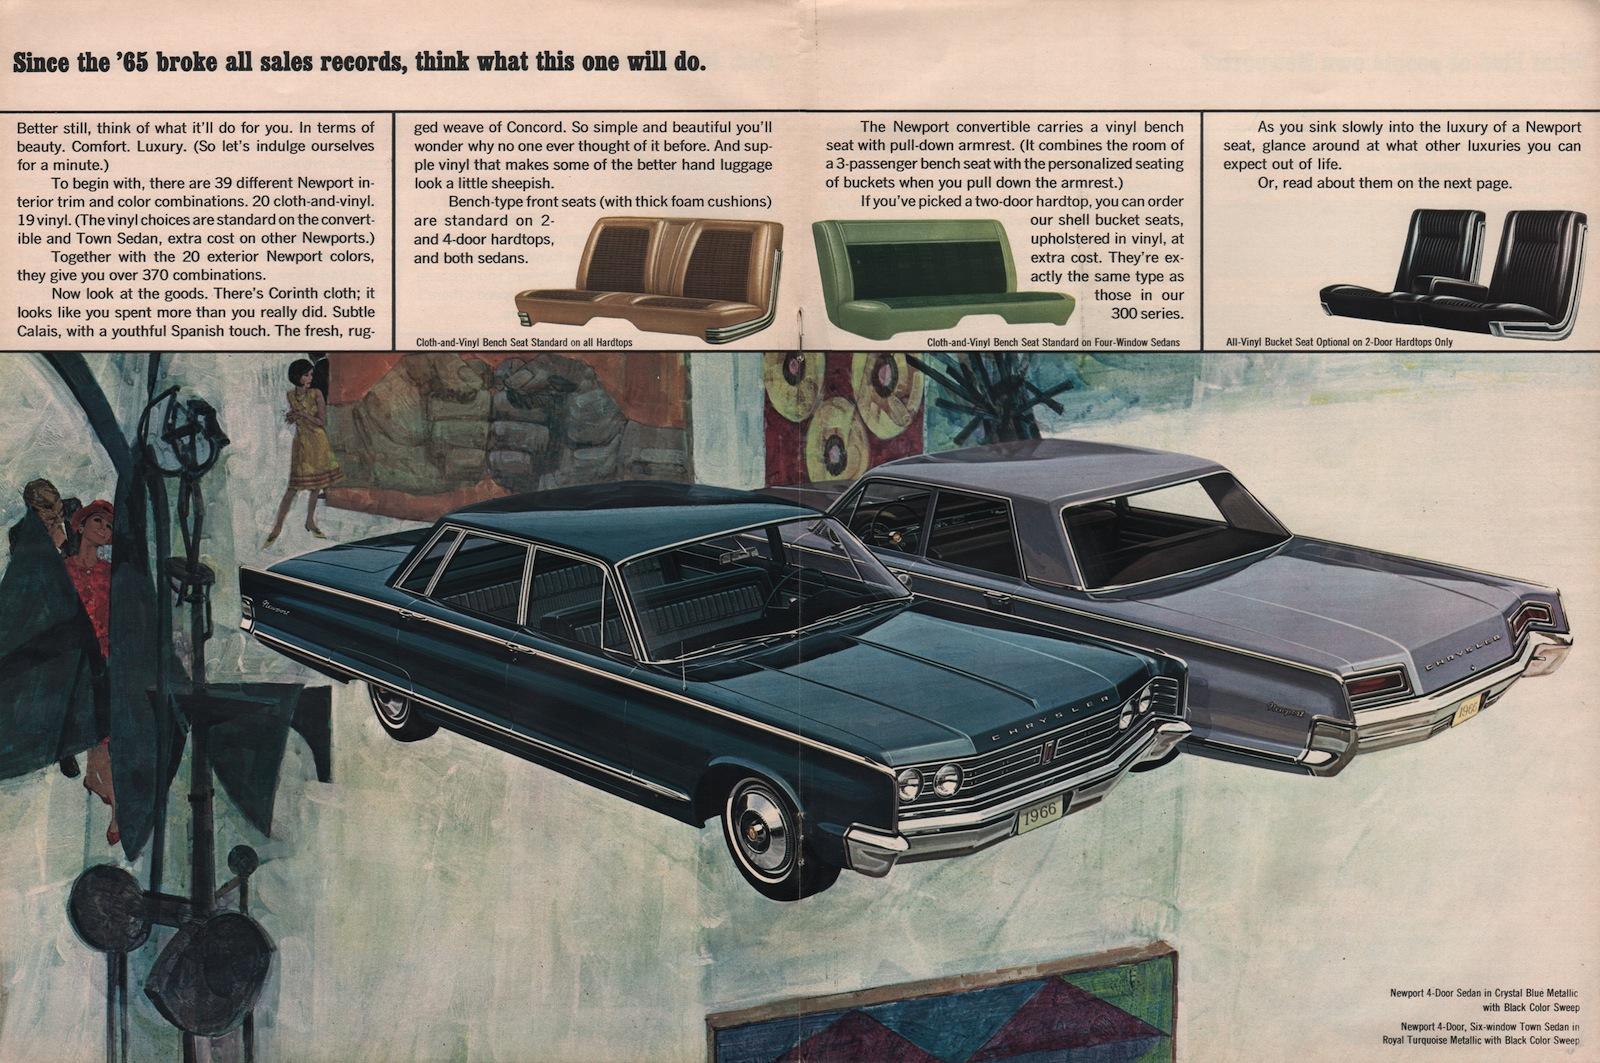 Chrysler on 1989 Jeep Wrangler Sales Brochure